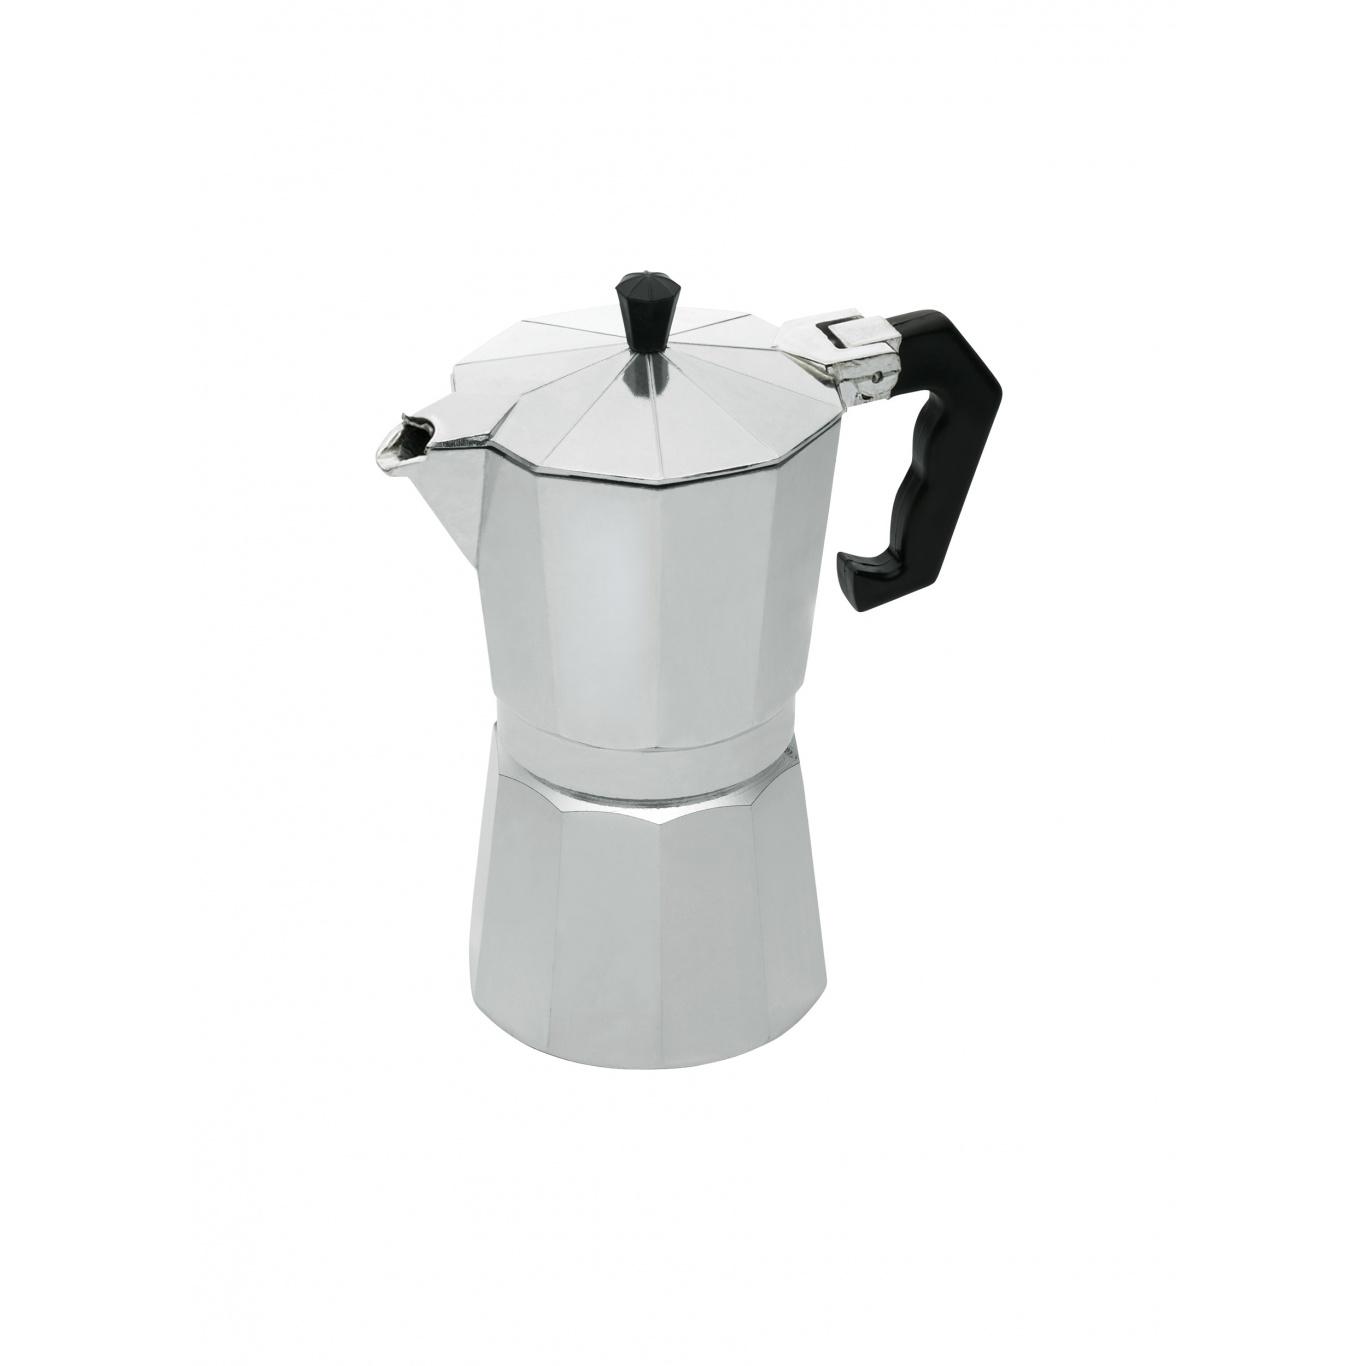 Image of Italian Style 6 Cup Espresso Maker